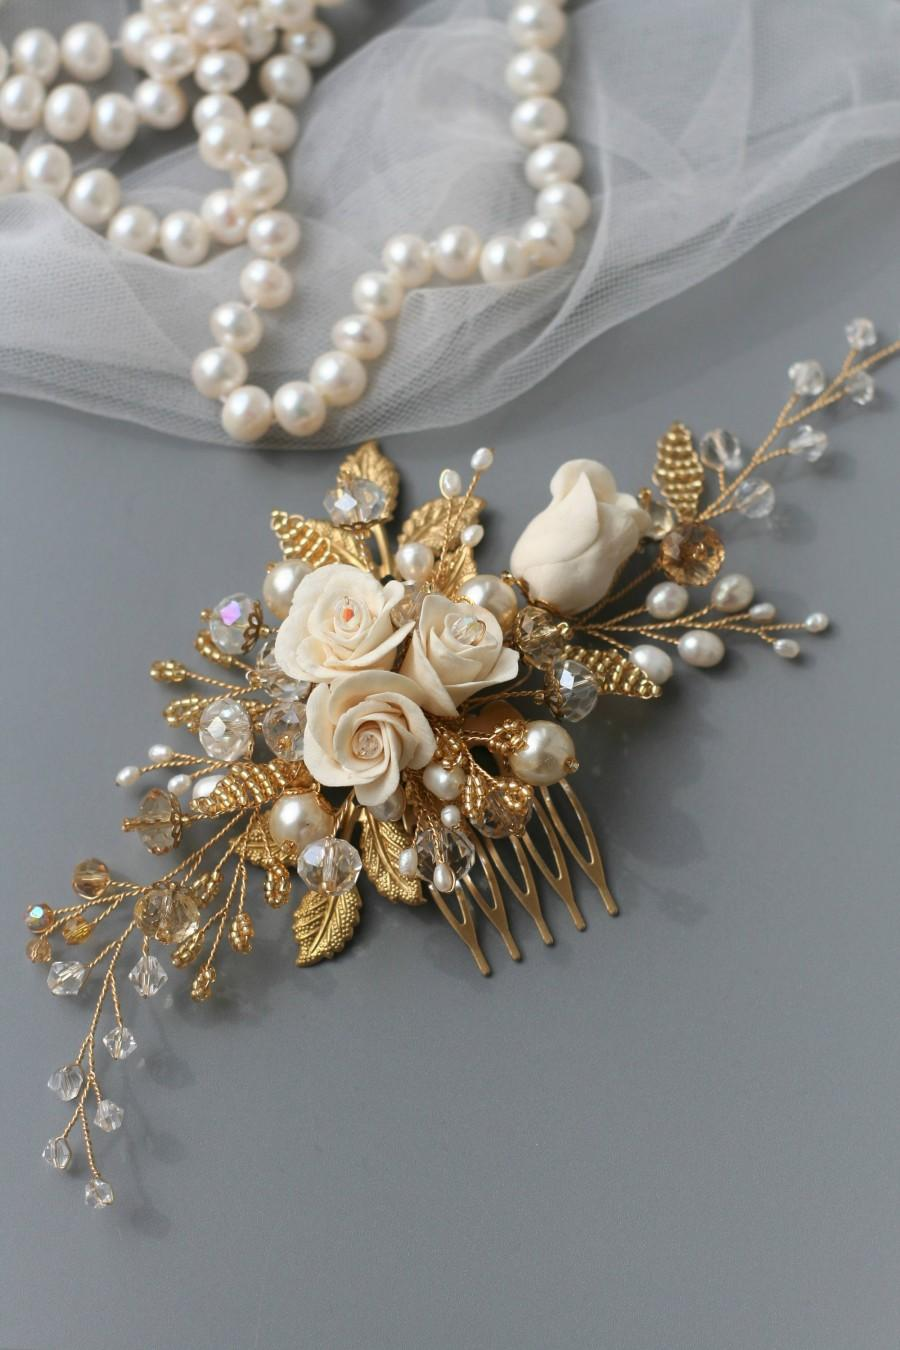 Wedding - Rose Comb, Rose Wedding hair comb, Bridal hair comb, Bridal hair accessories, Bridal comb, Pearl headpiece, Wedding hair accessories - $75.00 USD